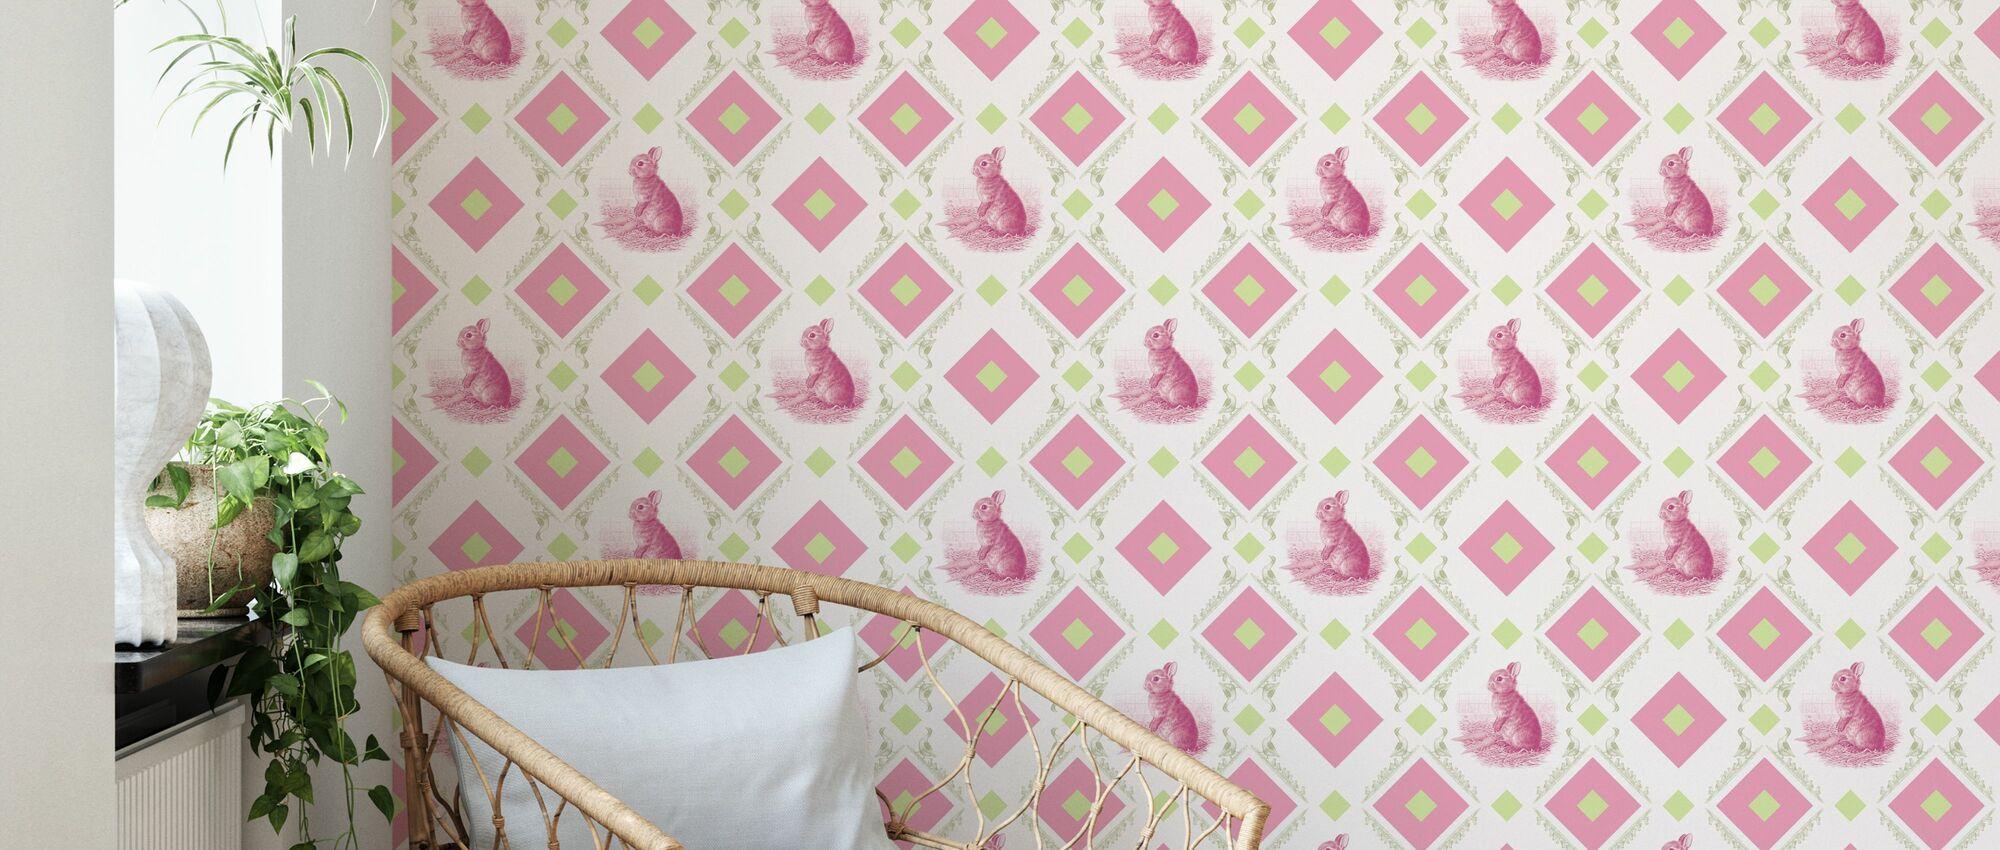 Young Rabbit - Gooseframe - Pink Green - Wallpaper - Living Room